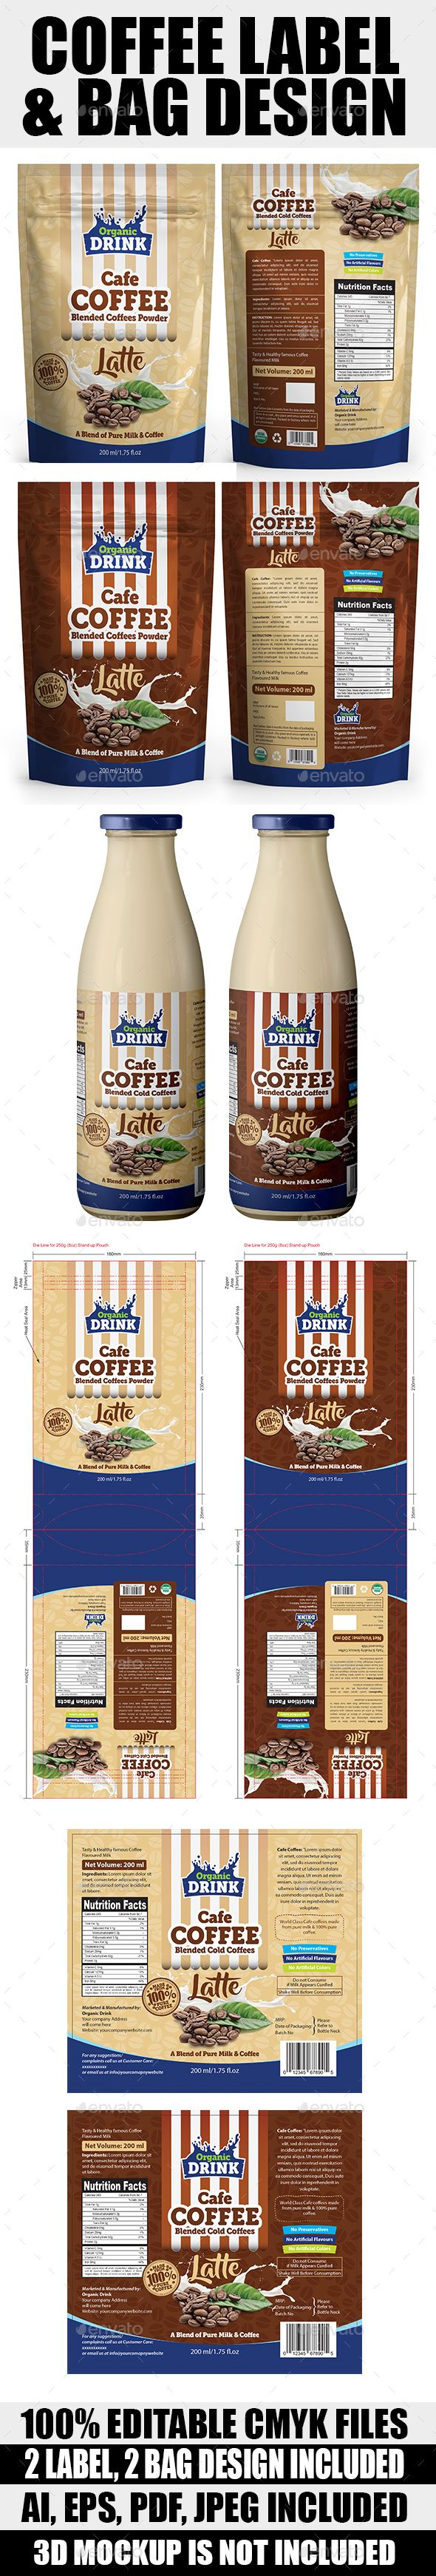 Coffee Label & Bag Templates